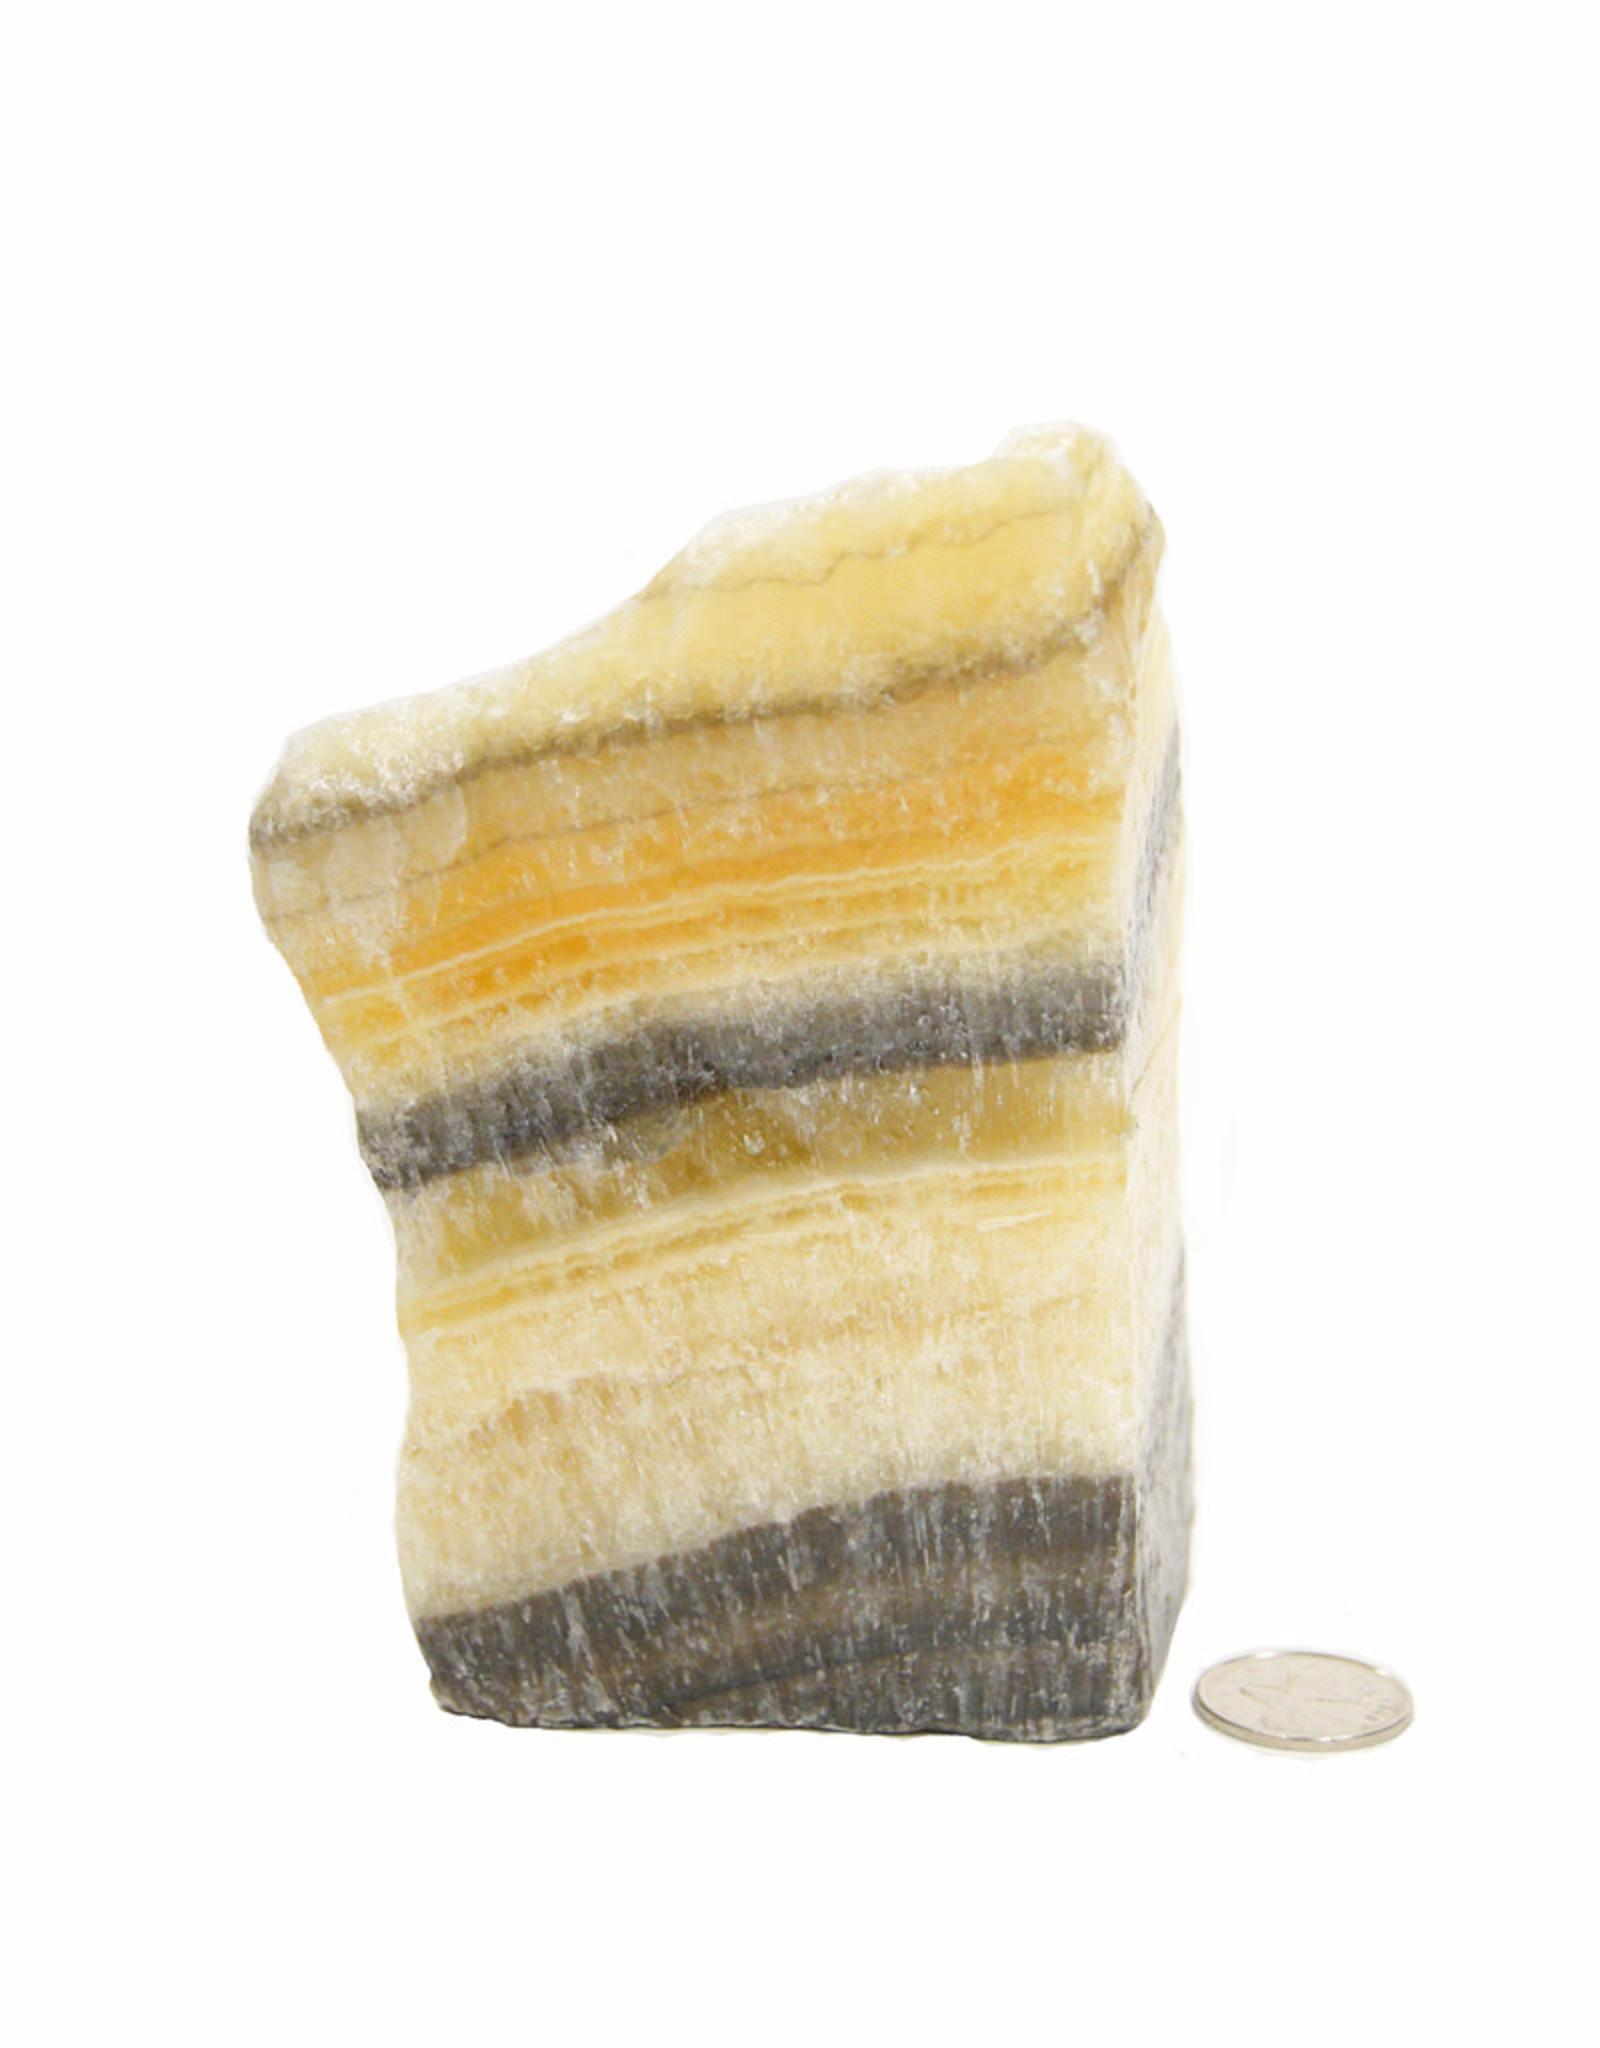 Black Onyx with Yellow Calcite Freeform $65